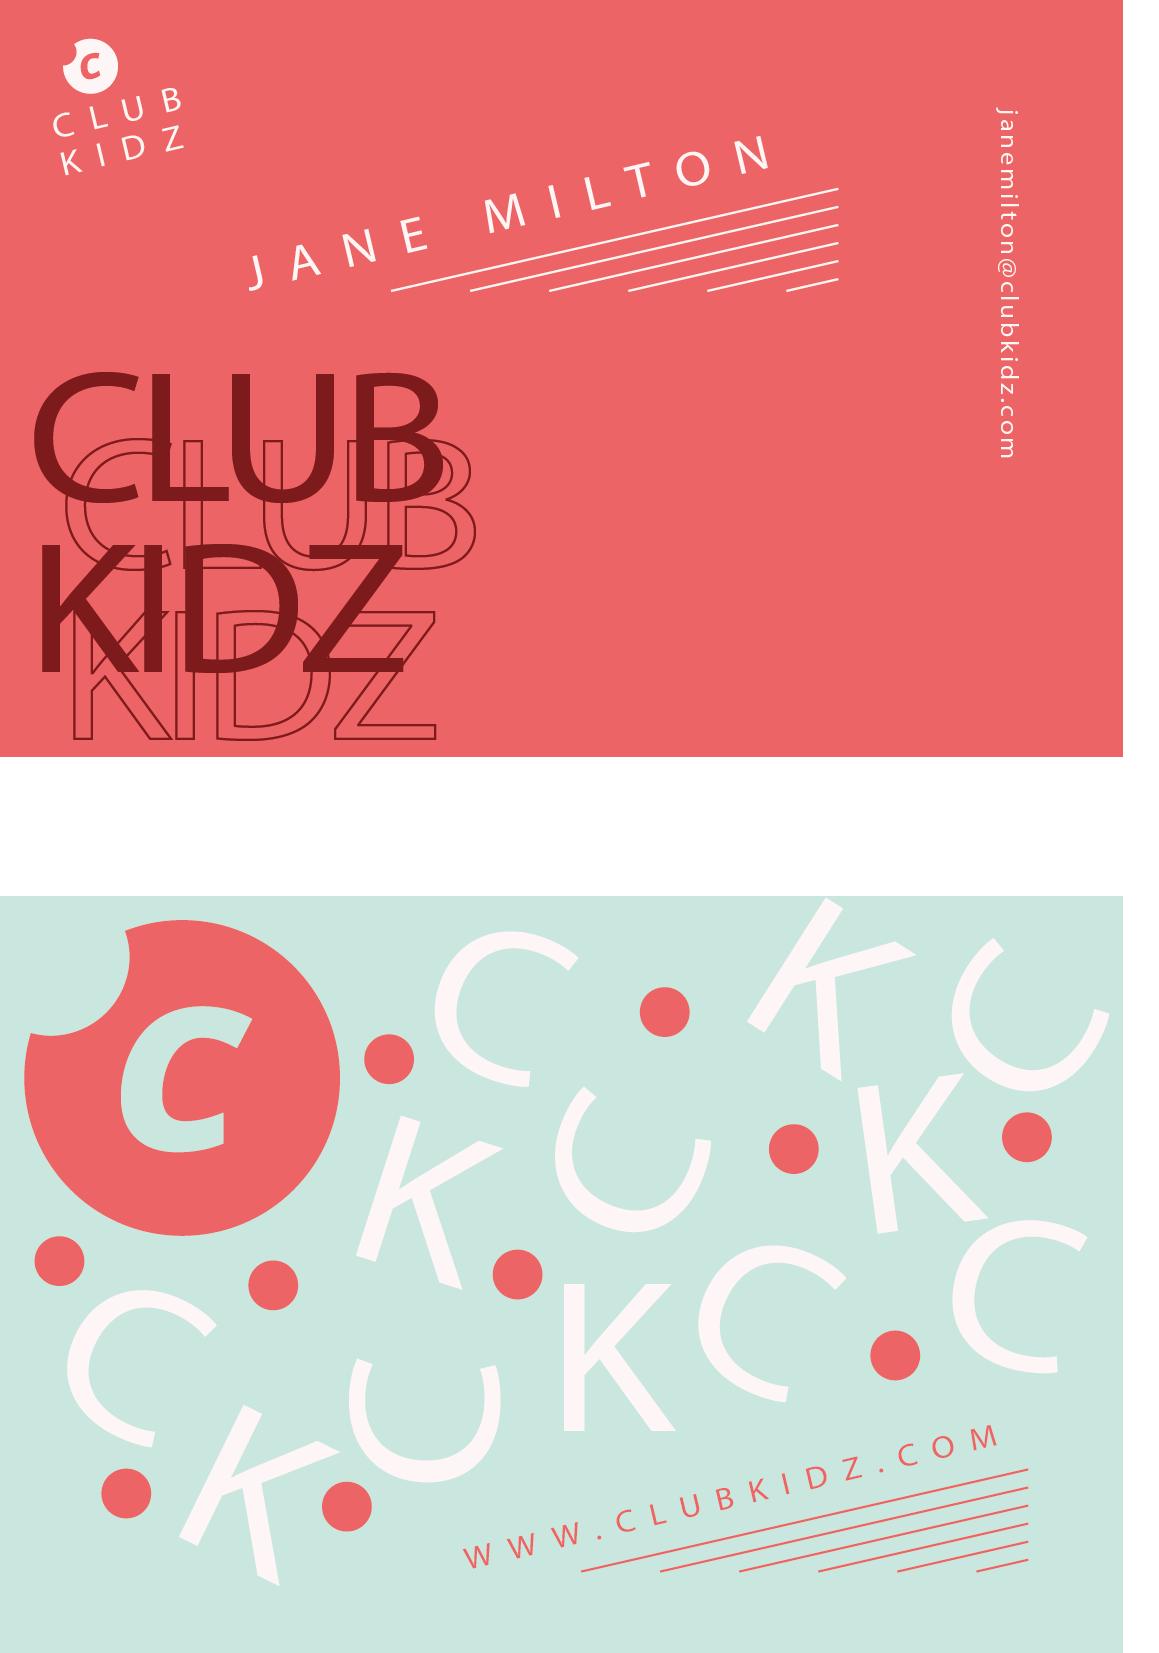 Club Kidz